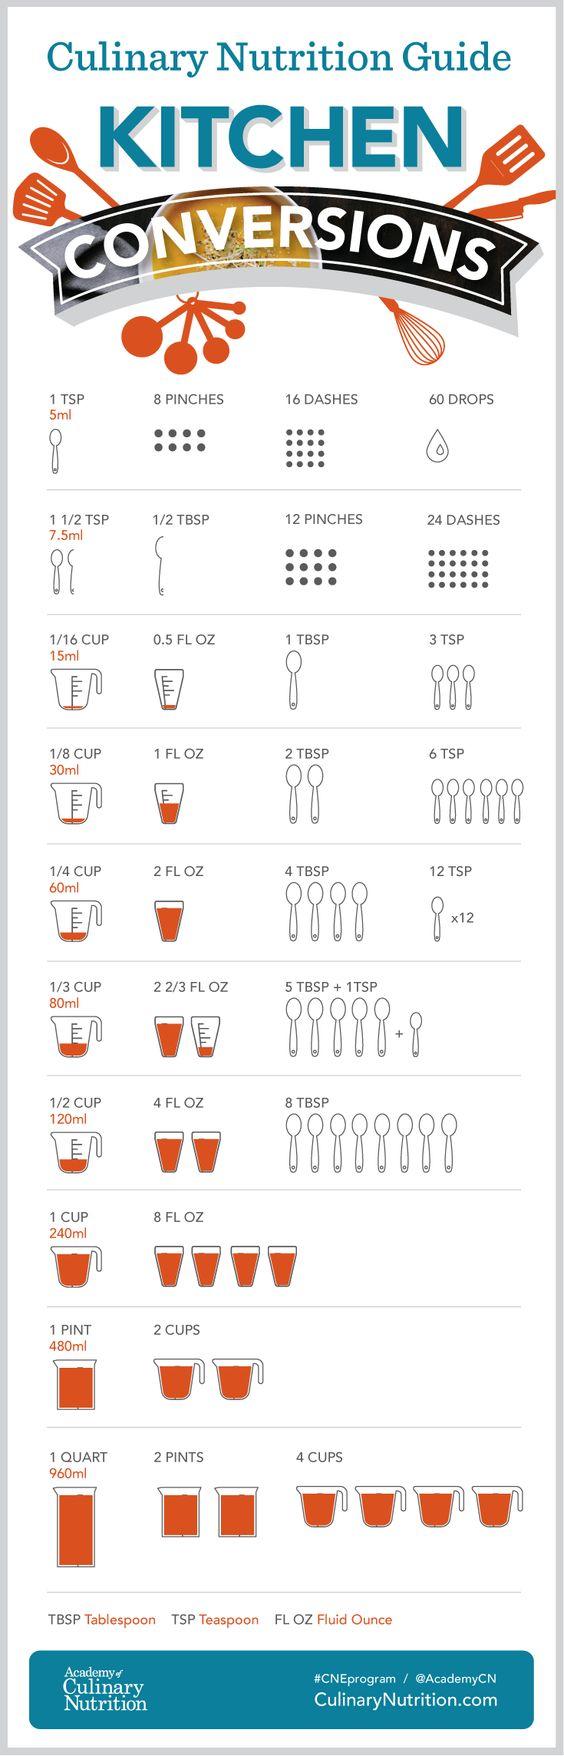 Culinary Nutrition Kitchen Conversion Chart #conversions #kitchentips #kitchenhacks